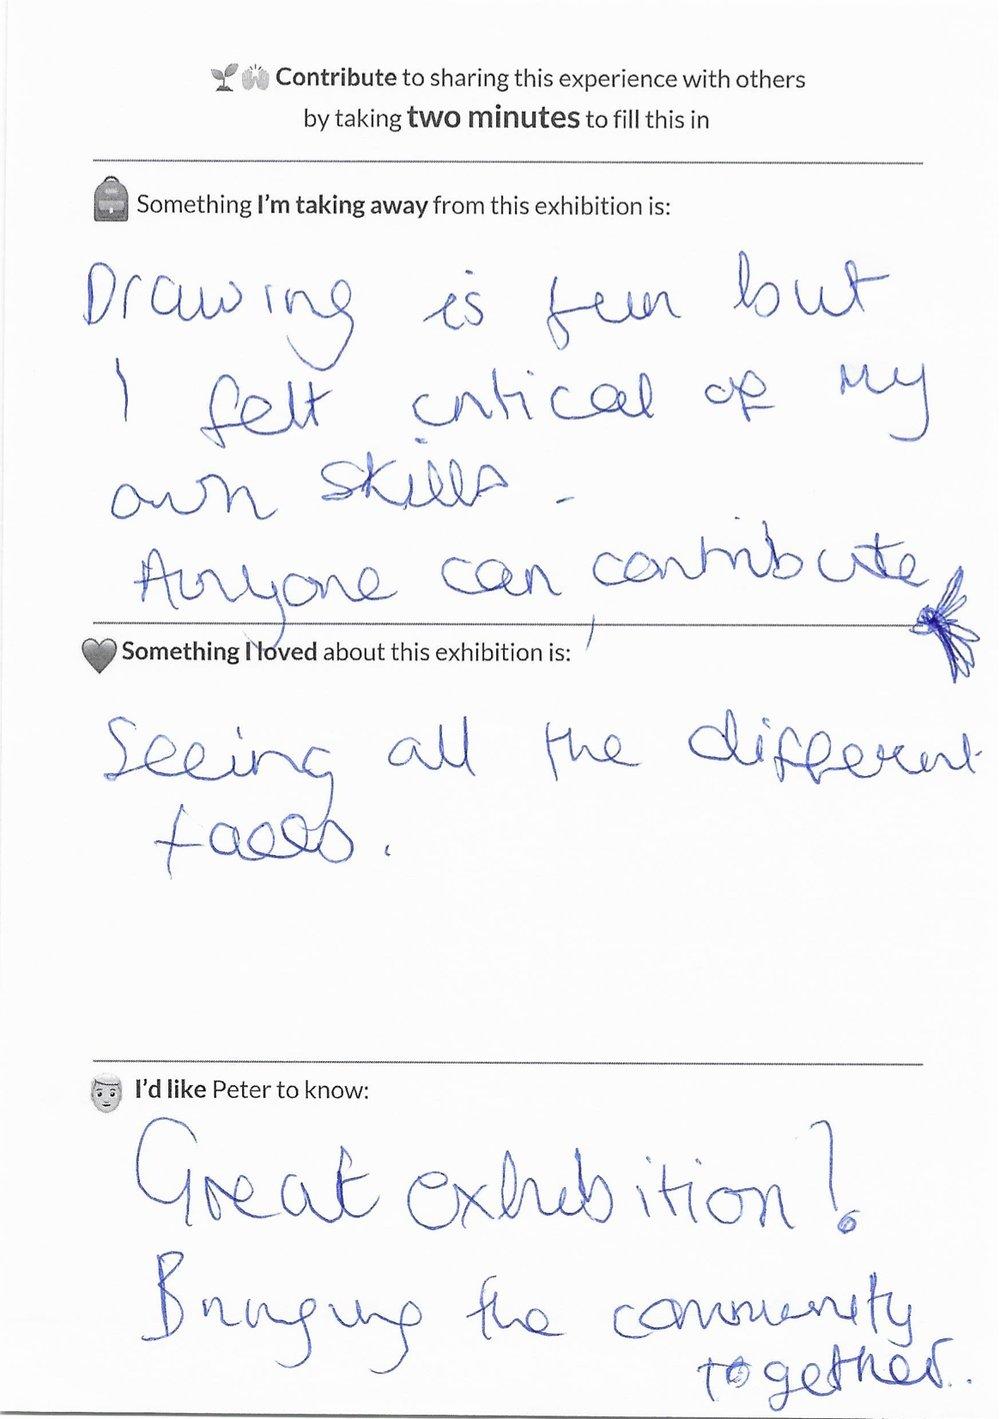 Drawn-in reflections-088.jpg